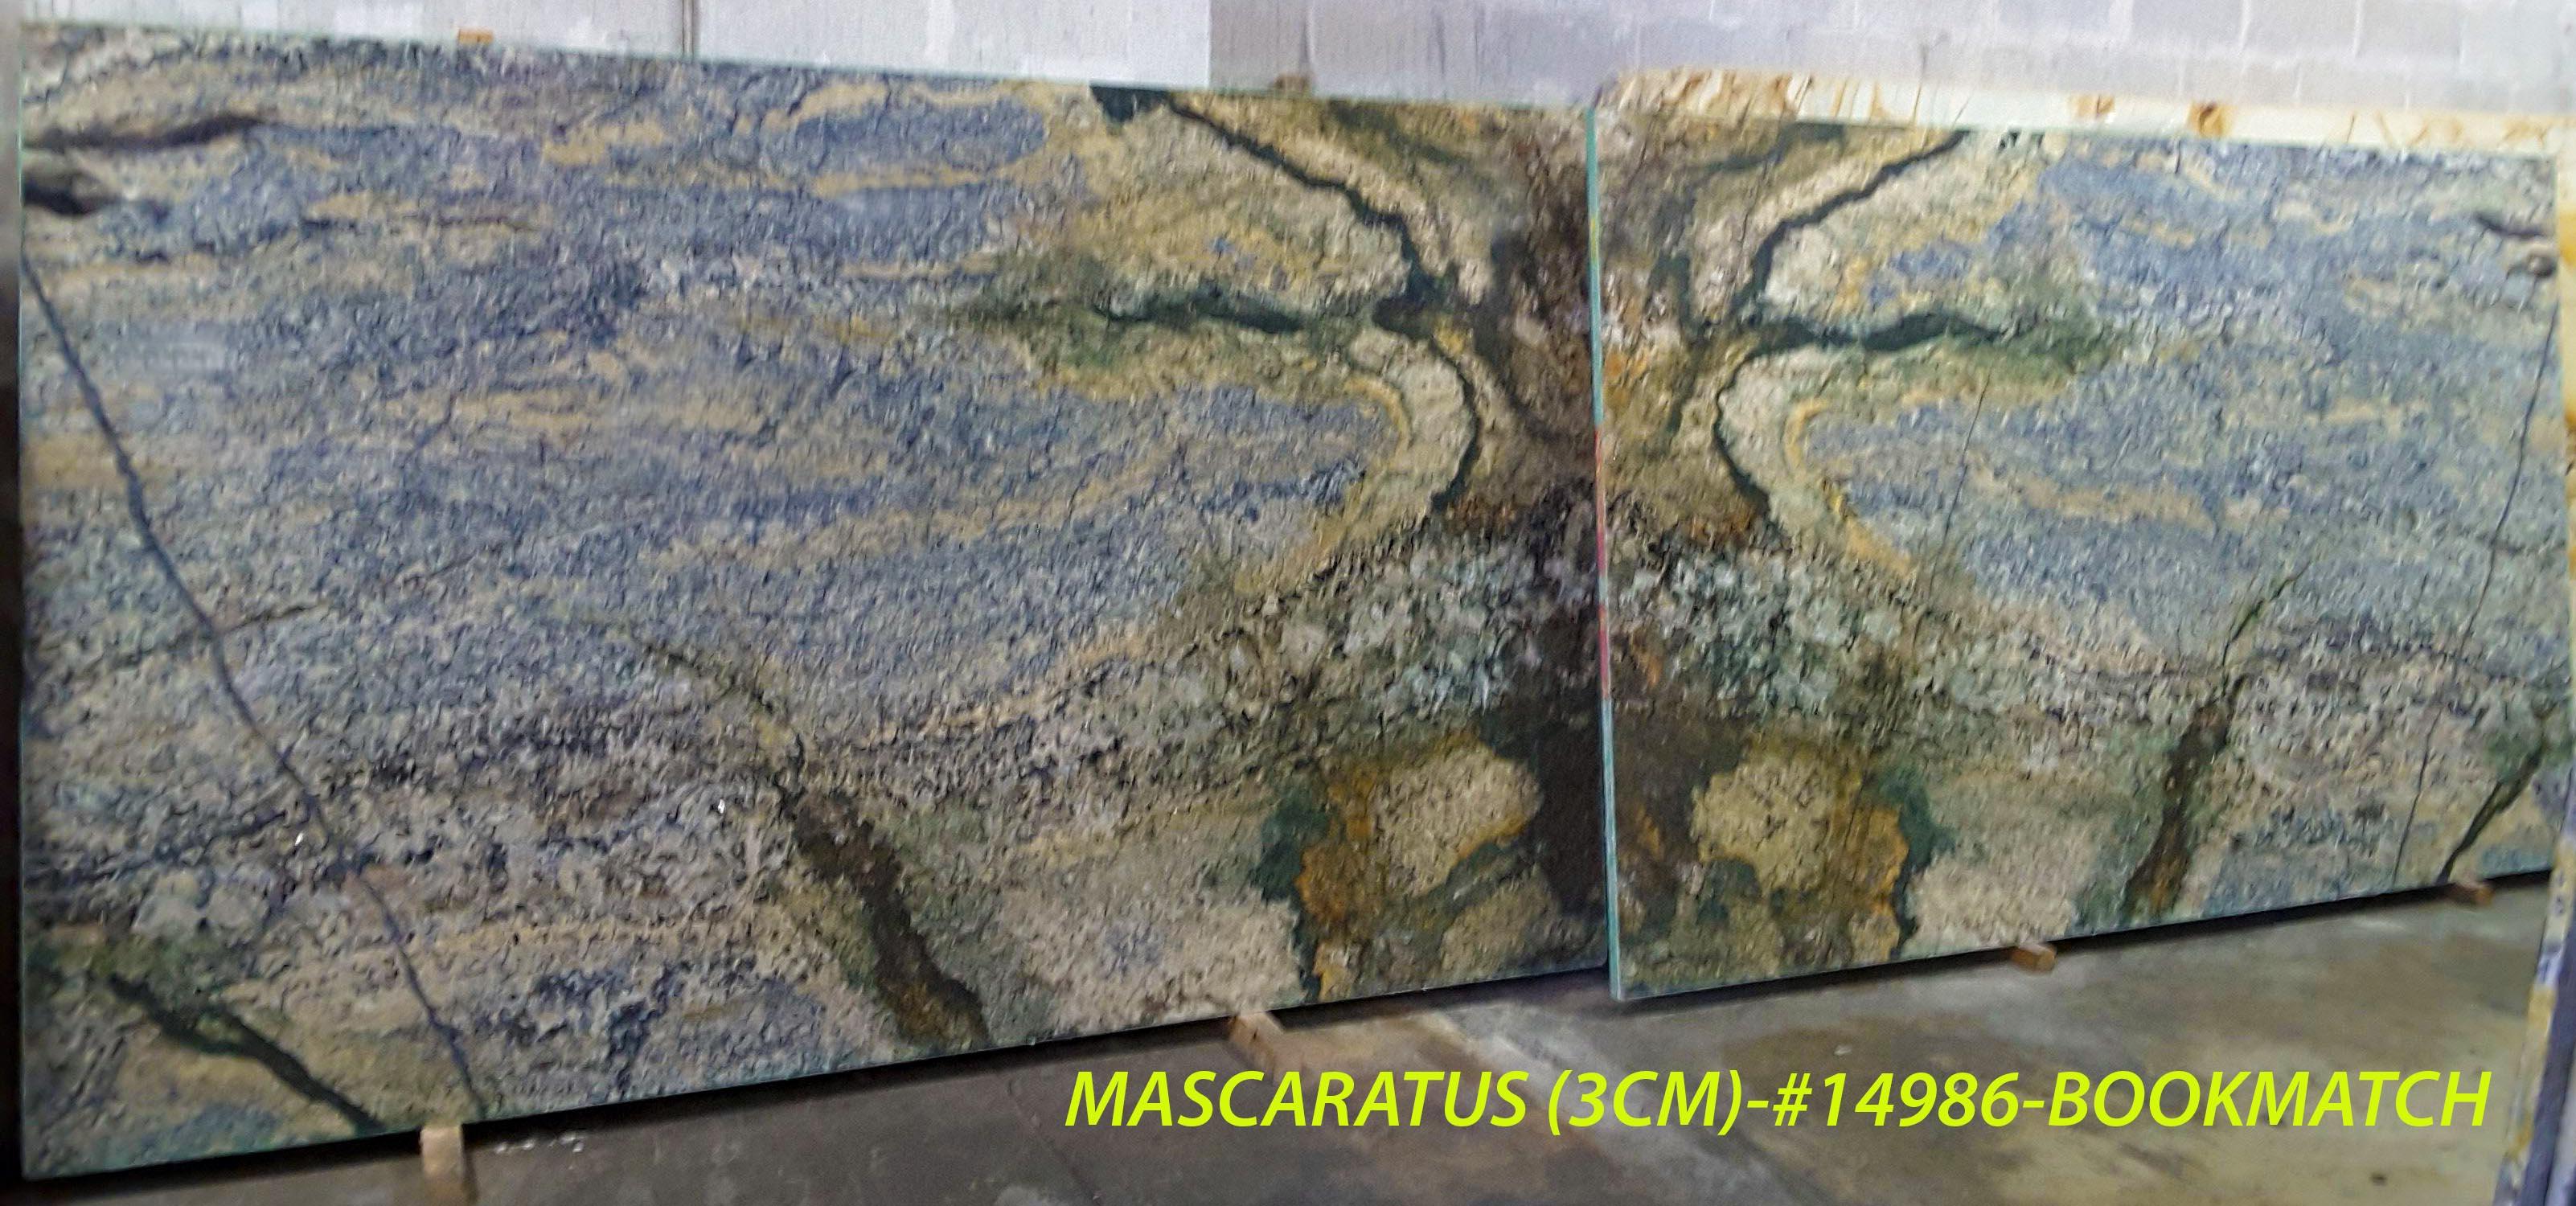 MASCARATUS (3 CM)-#14986-BOOKMATCH